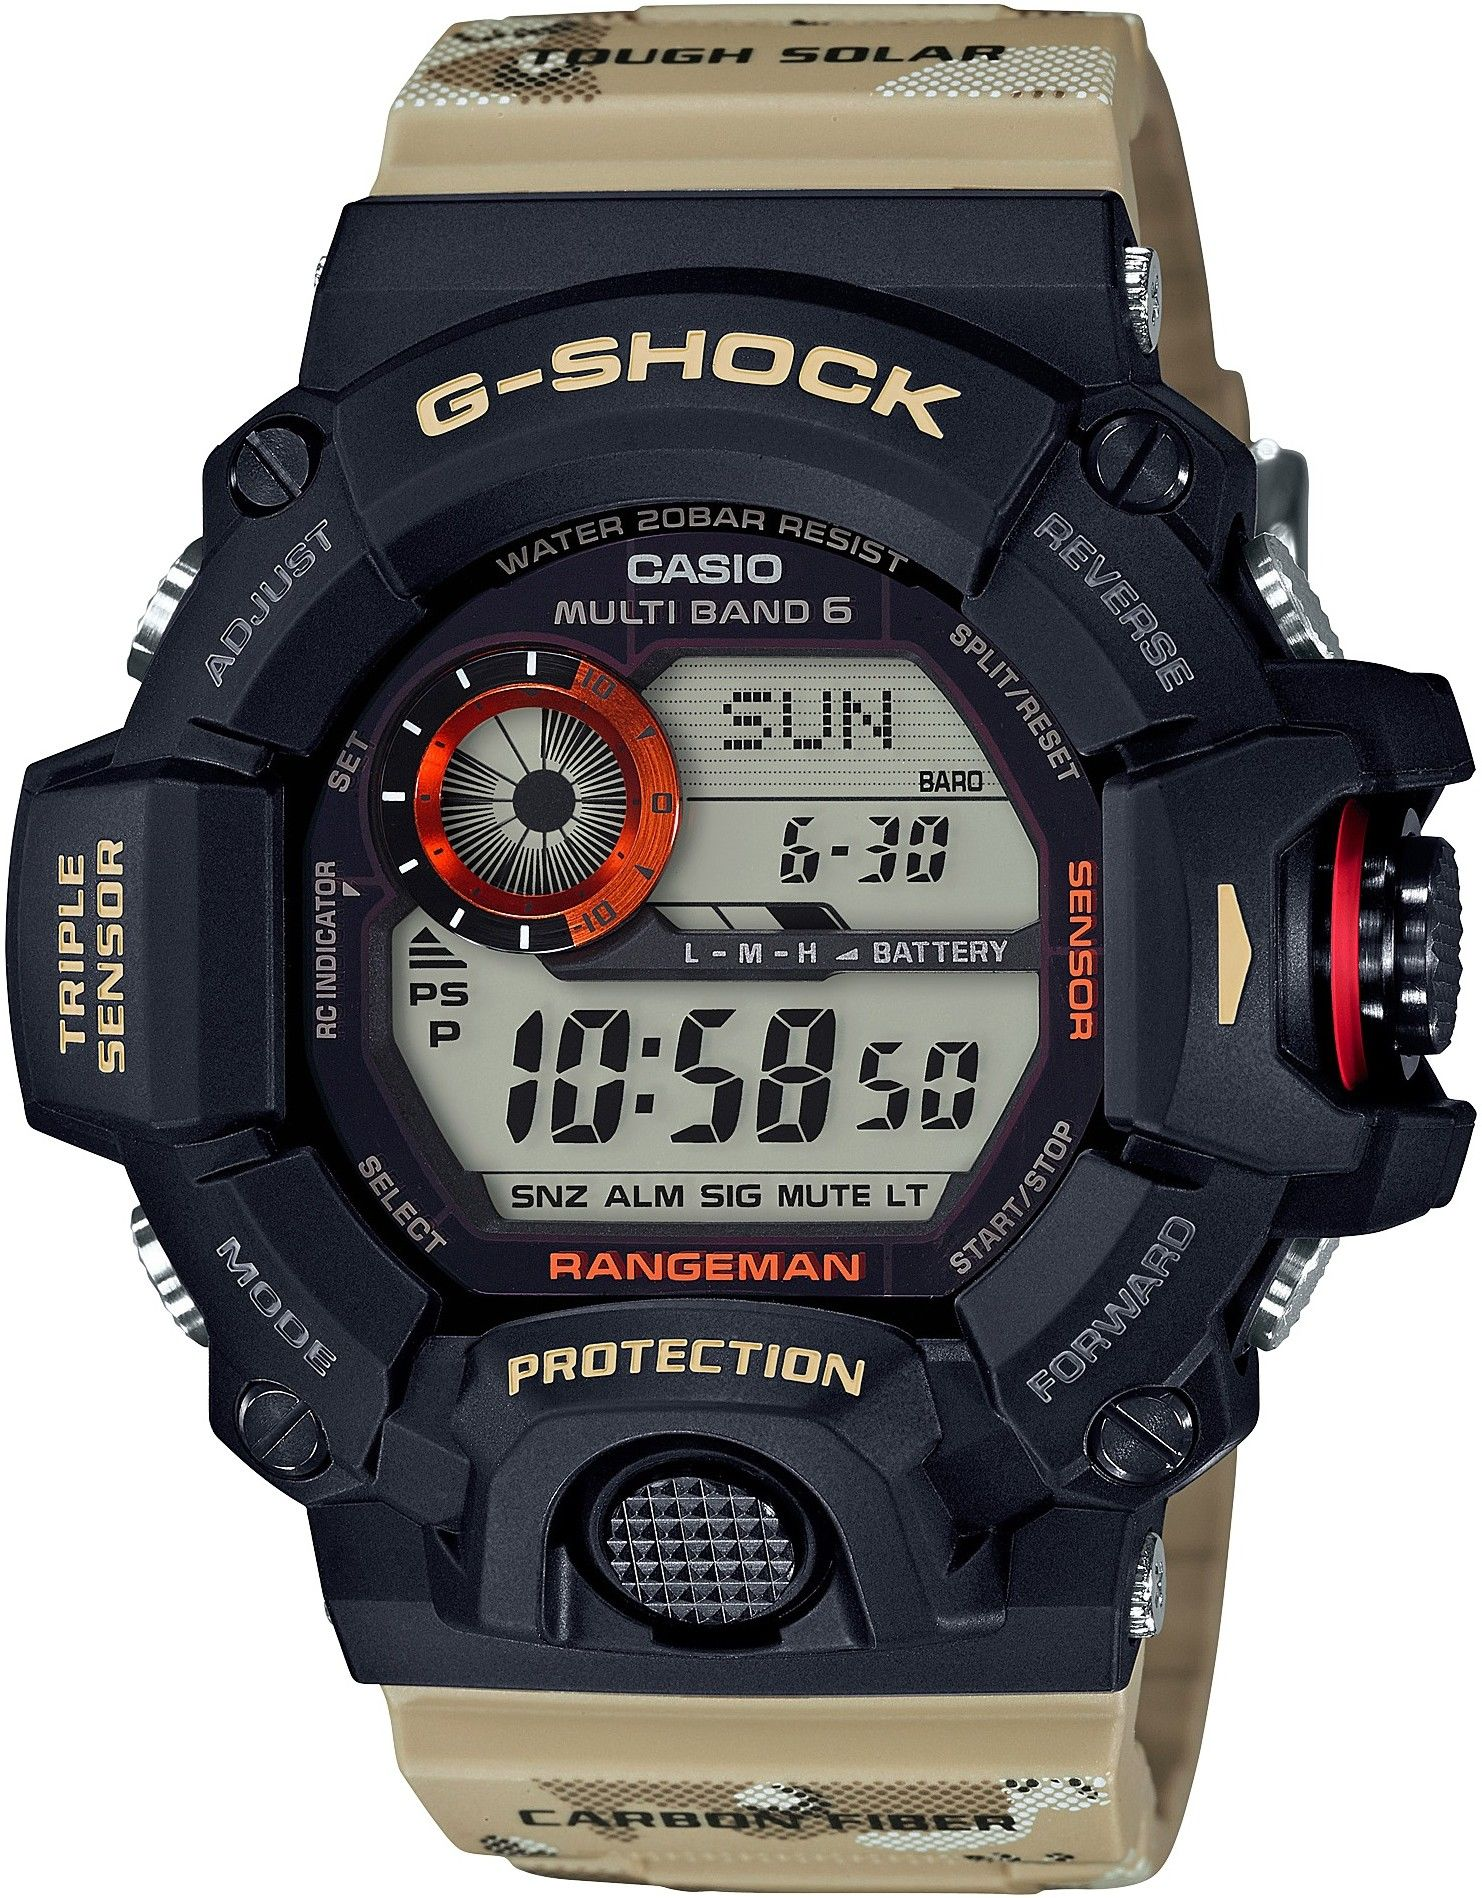 Casio G-Shock Rangeman GW-9400DCJ-1ER